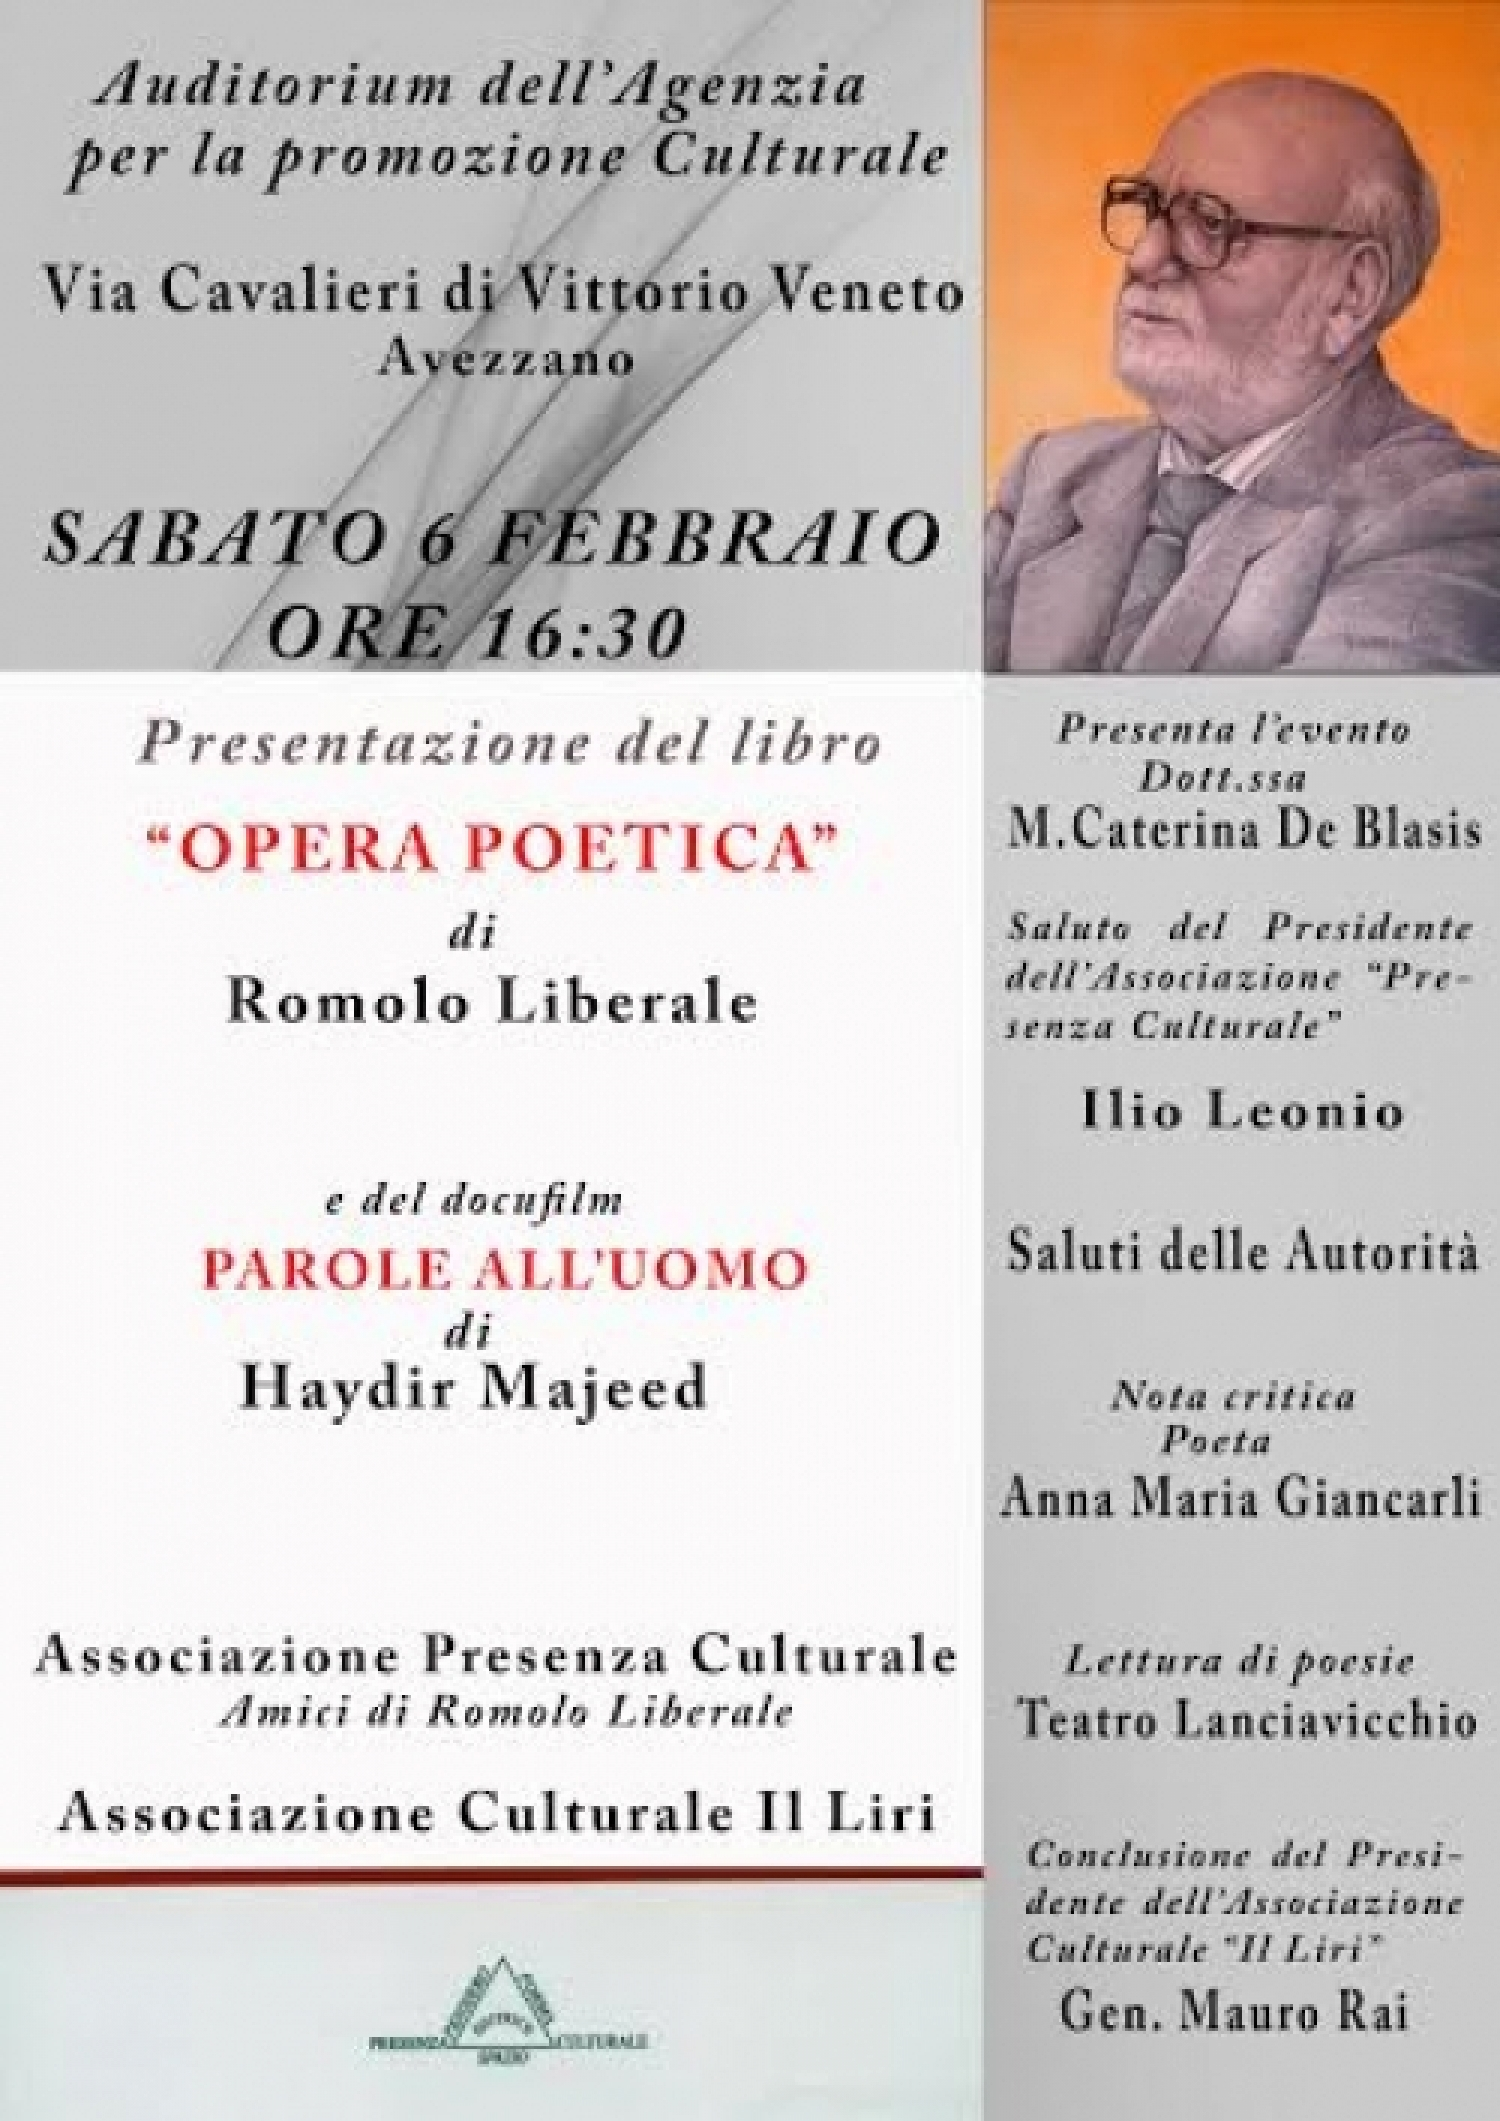 Locandina Romolo Liberale.jpg